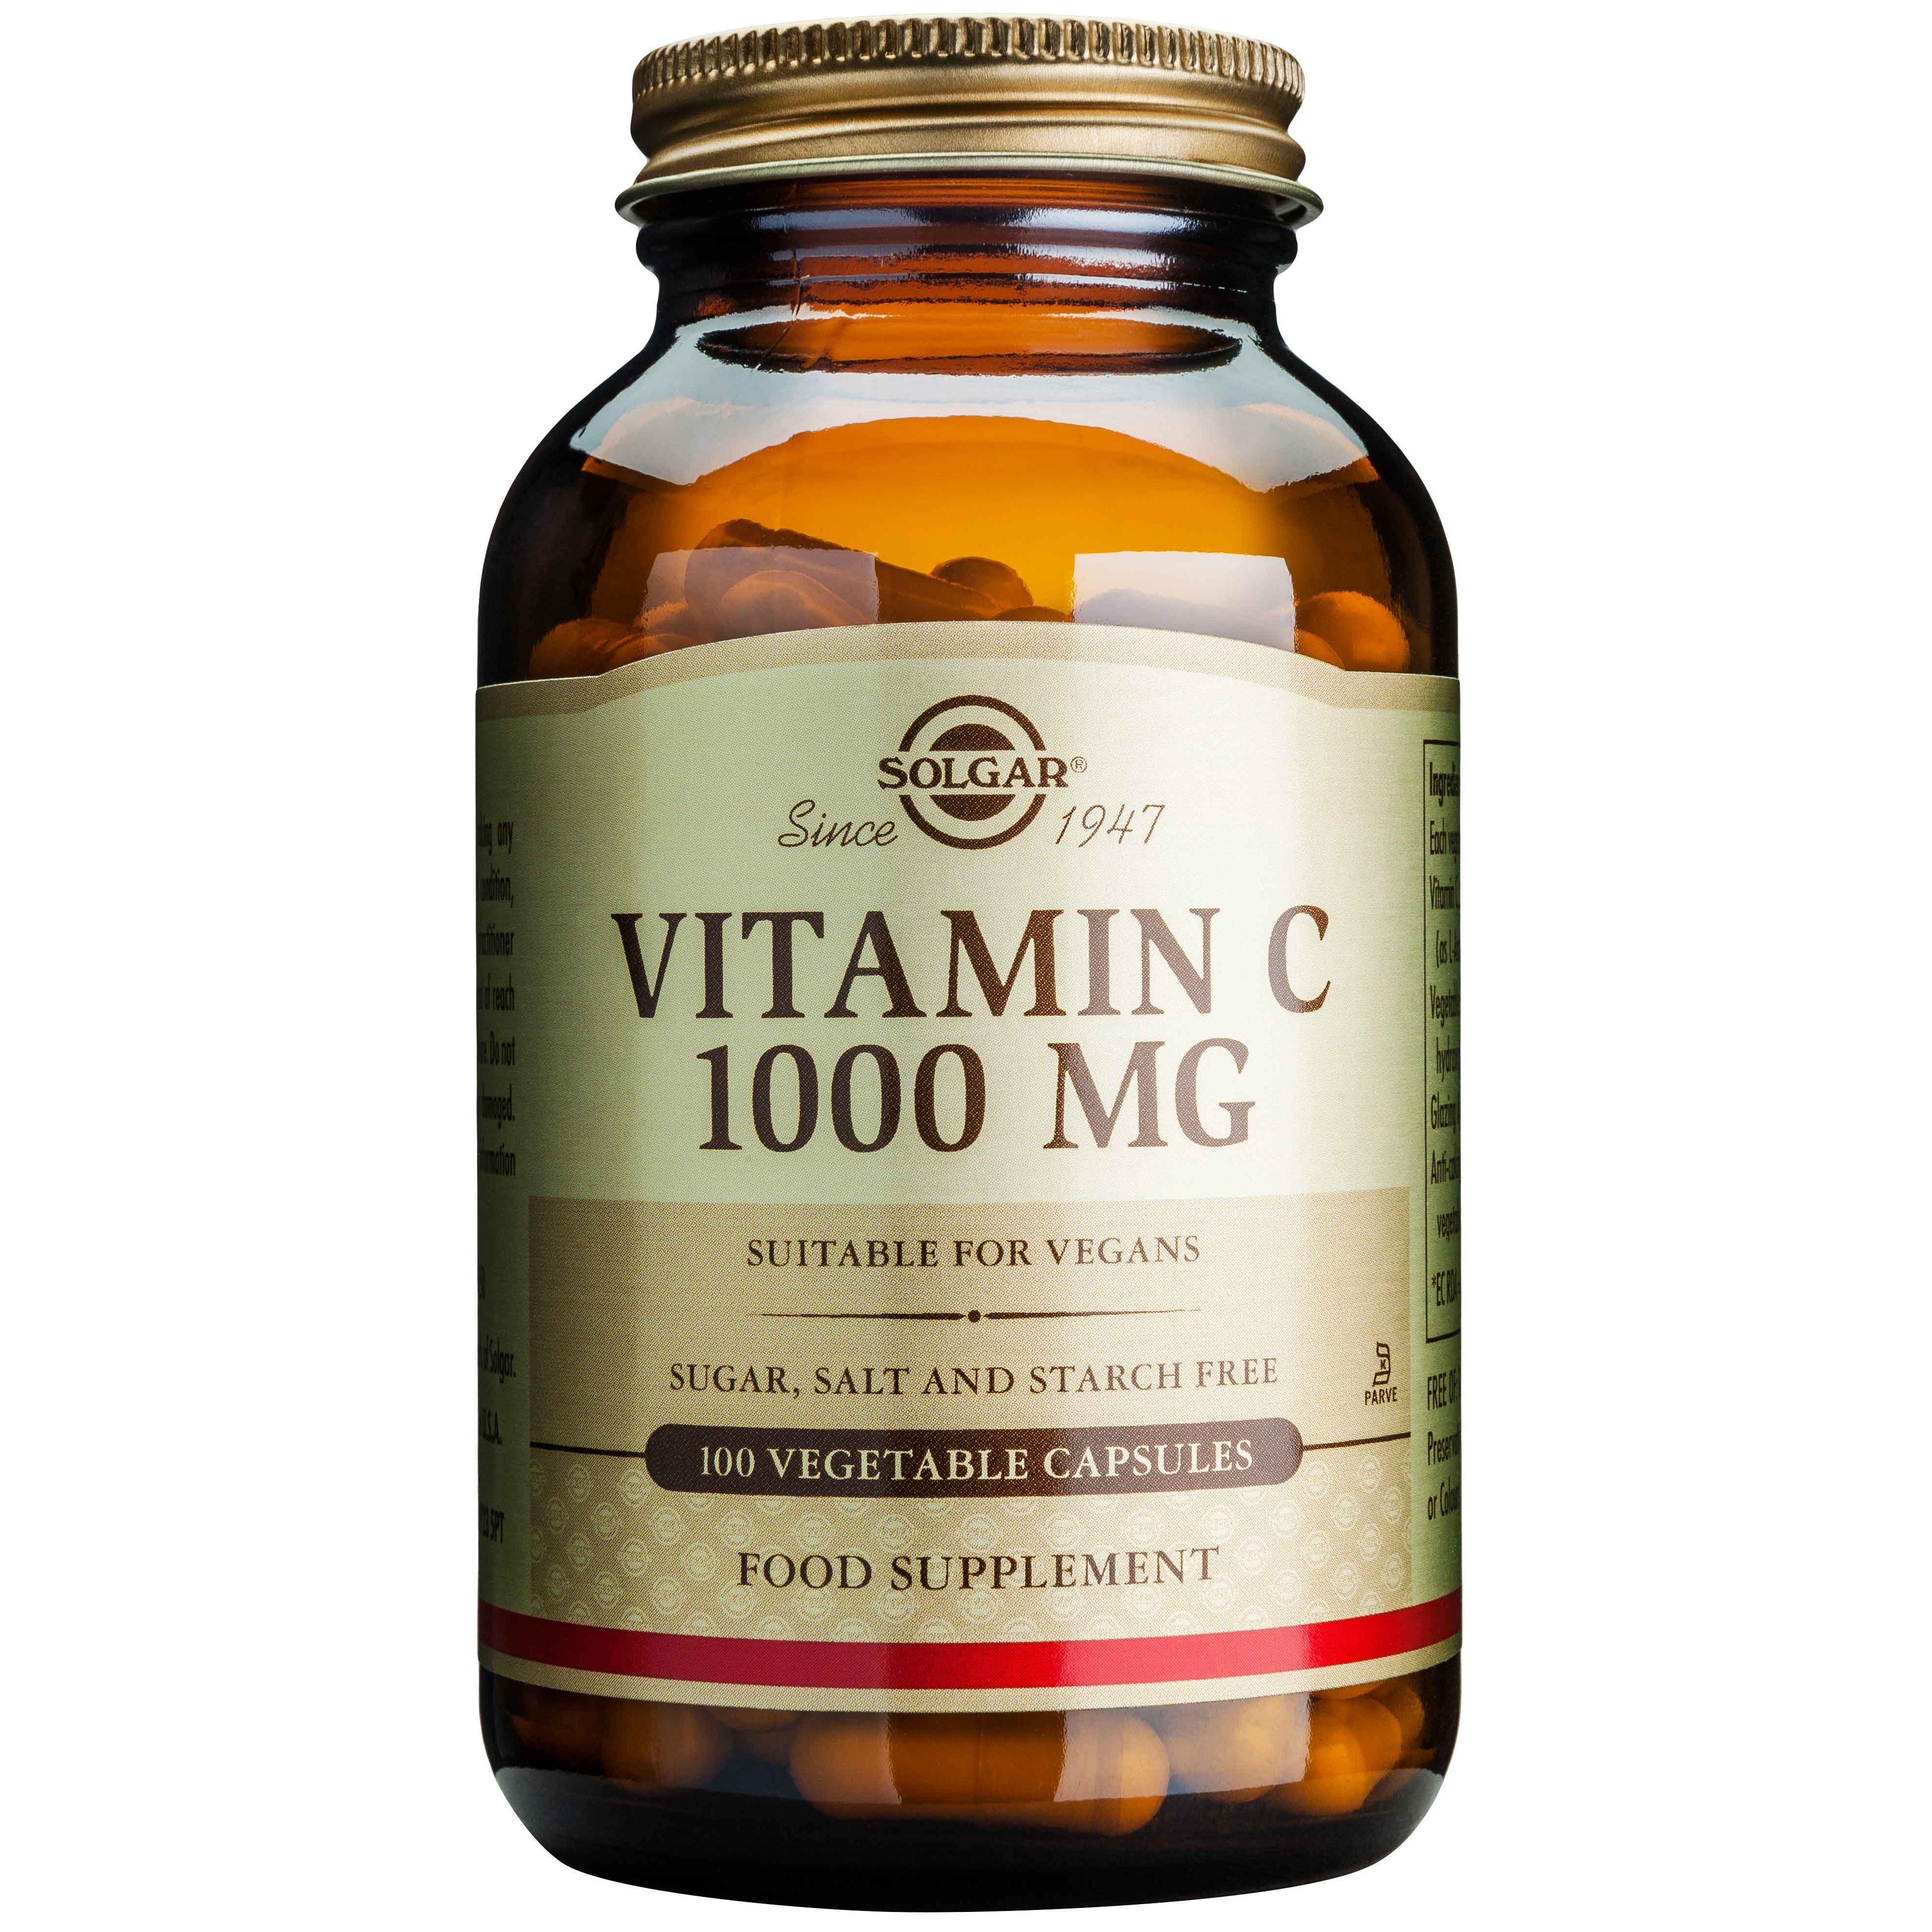 Solgar Vitamin C Αντιοξειδωτική Βιταμίνη Απαραίτητη για την Υγεία του Οργανισμού veg.caps – 1000 mg/100 caps